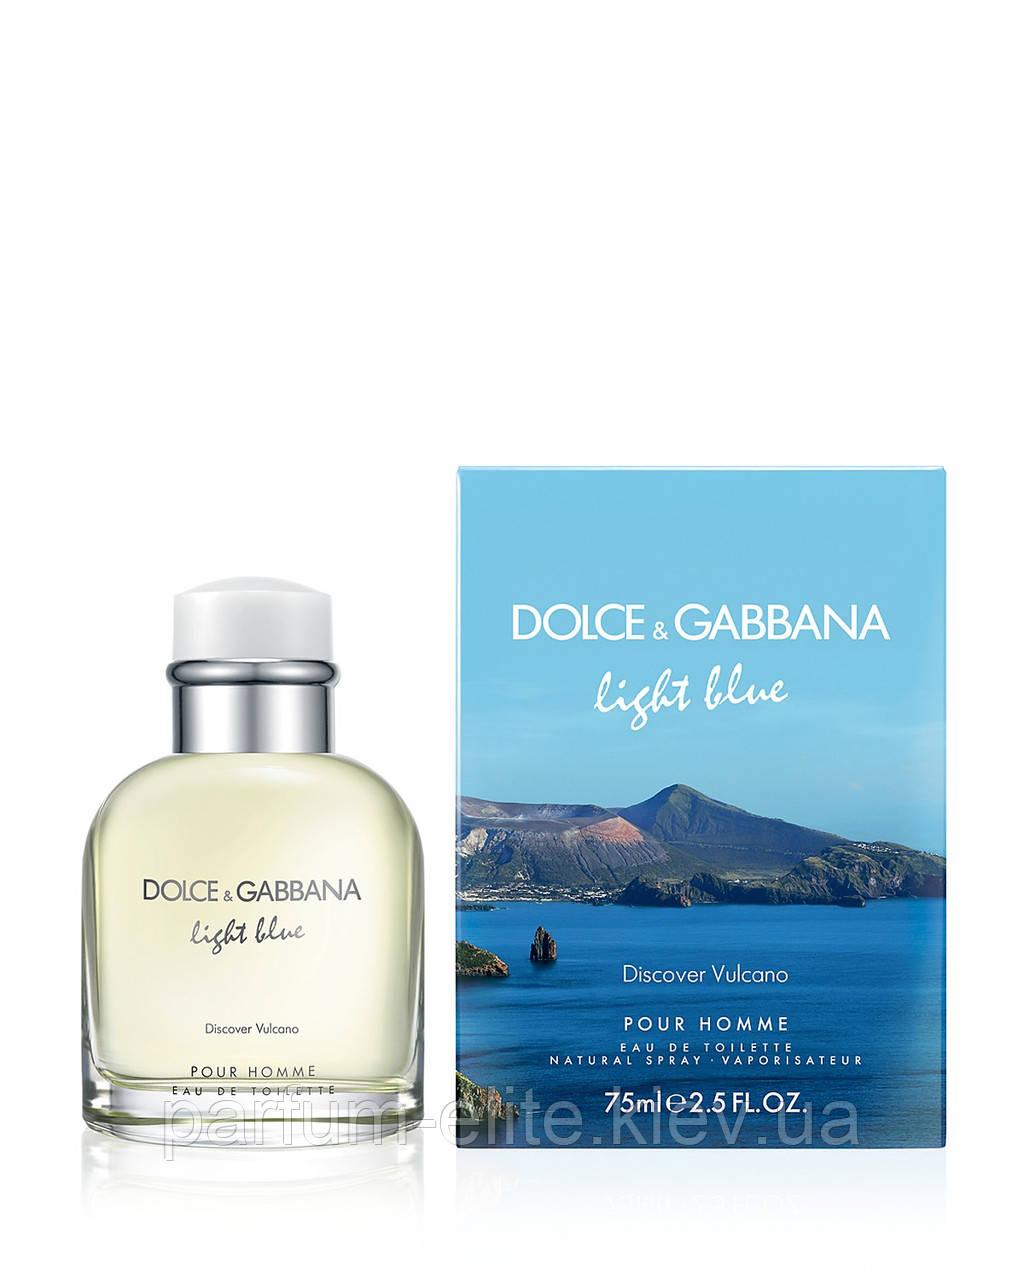 Мужская туалетная вода Dolce & Gabbana Light Blue Discover Vulcano Pour Homme 125ml(test)